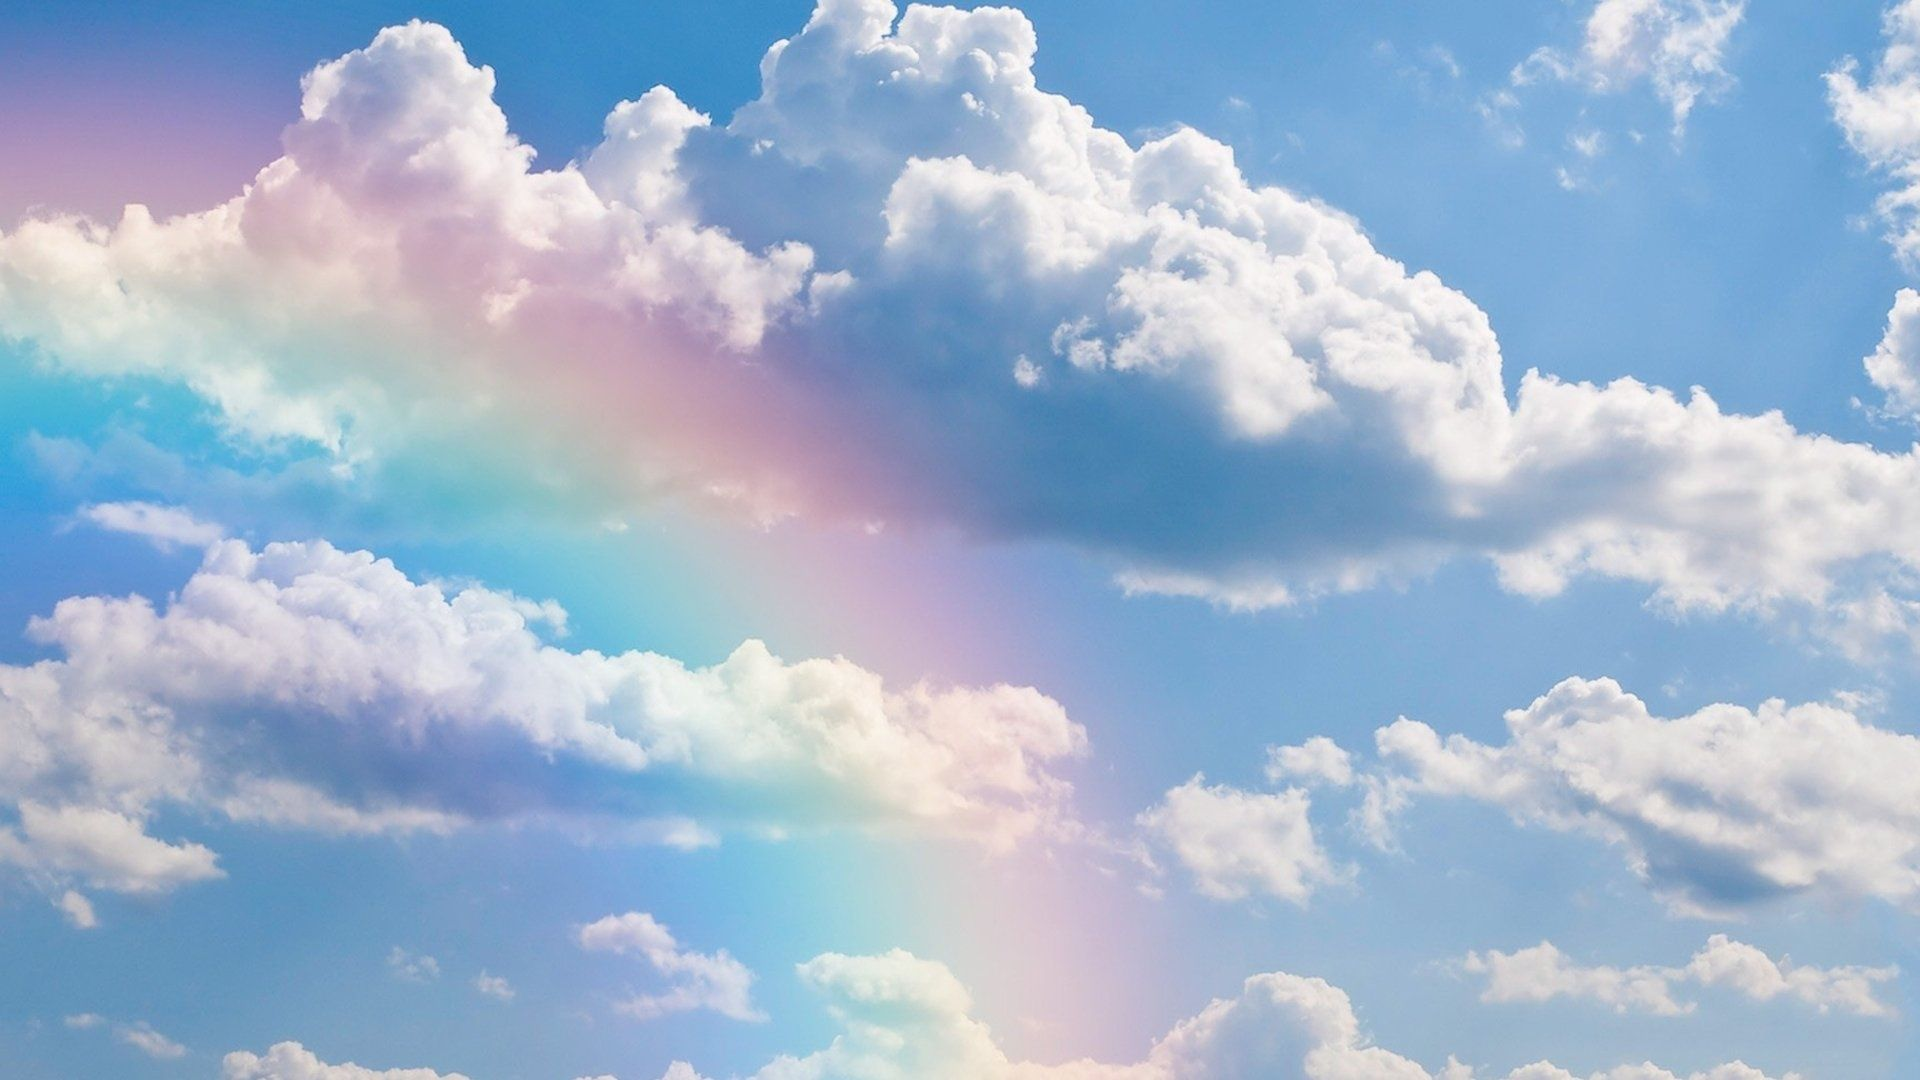 rainbows screensavers hd free